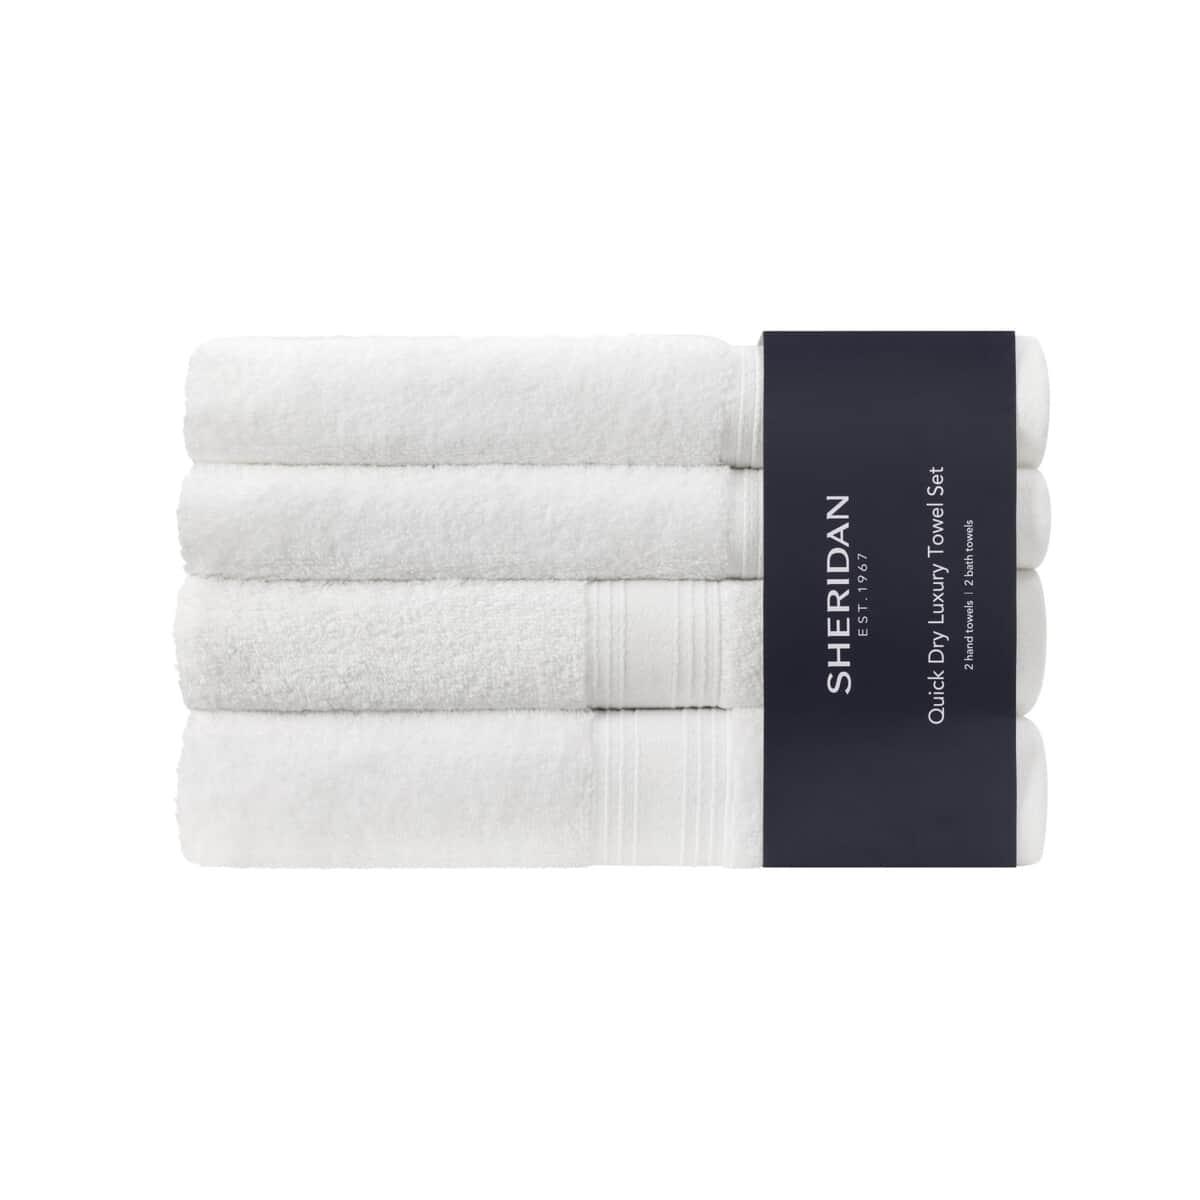 Sheridan Quick Dry Towel Bale White large